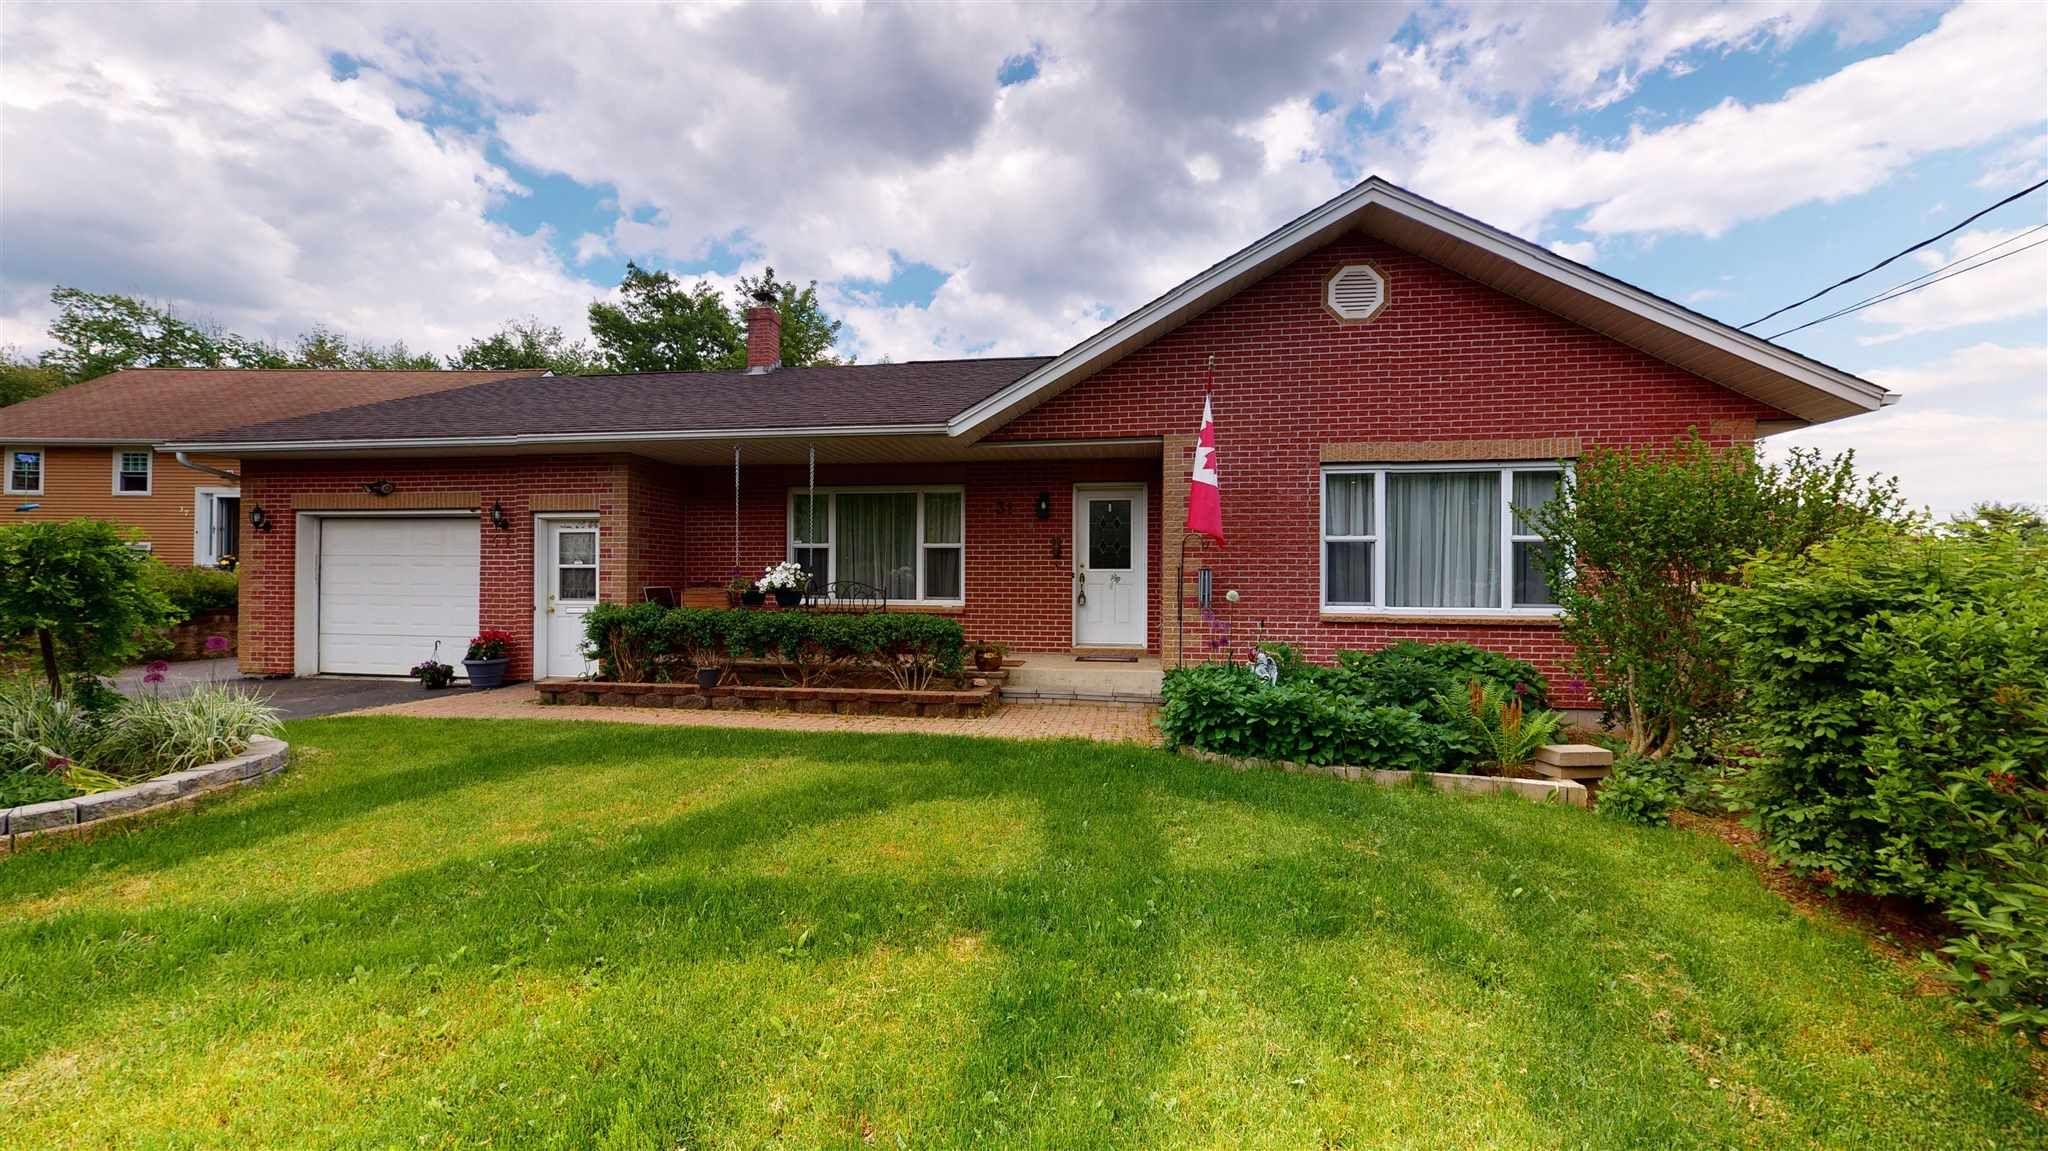 Main Photo: 31 Winburn Avenue in Bridgewater: 405-Lunenburg County Residential for sale (South Shore)  : MLS®# 202114301